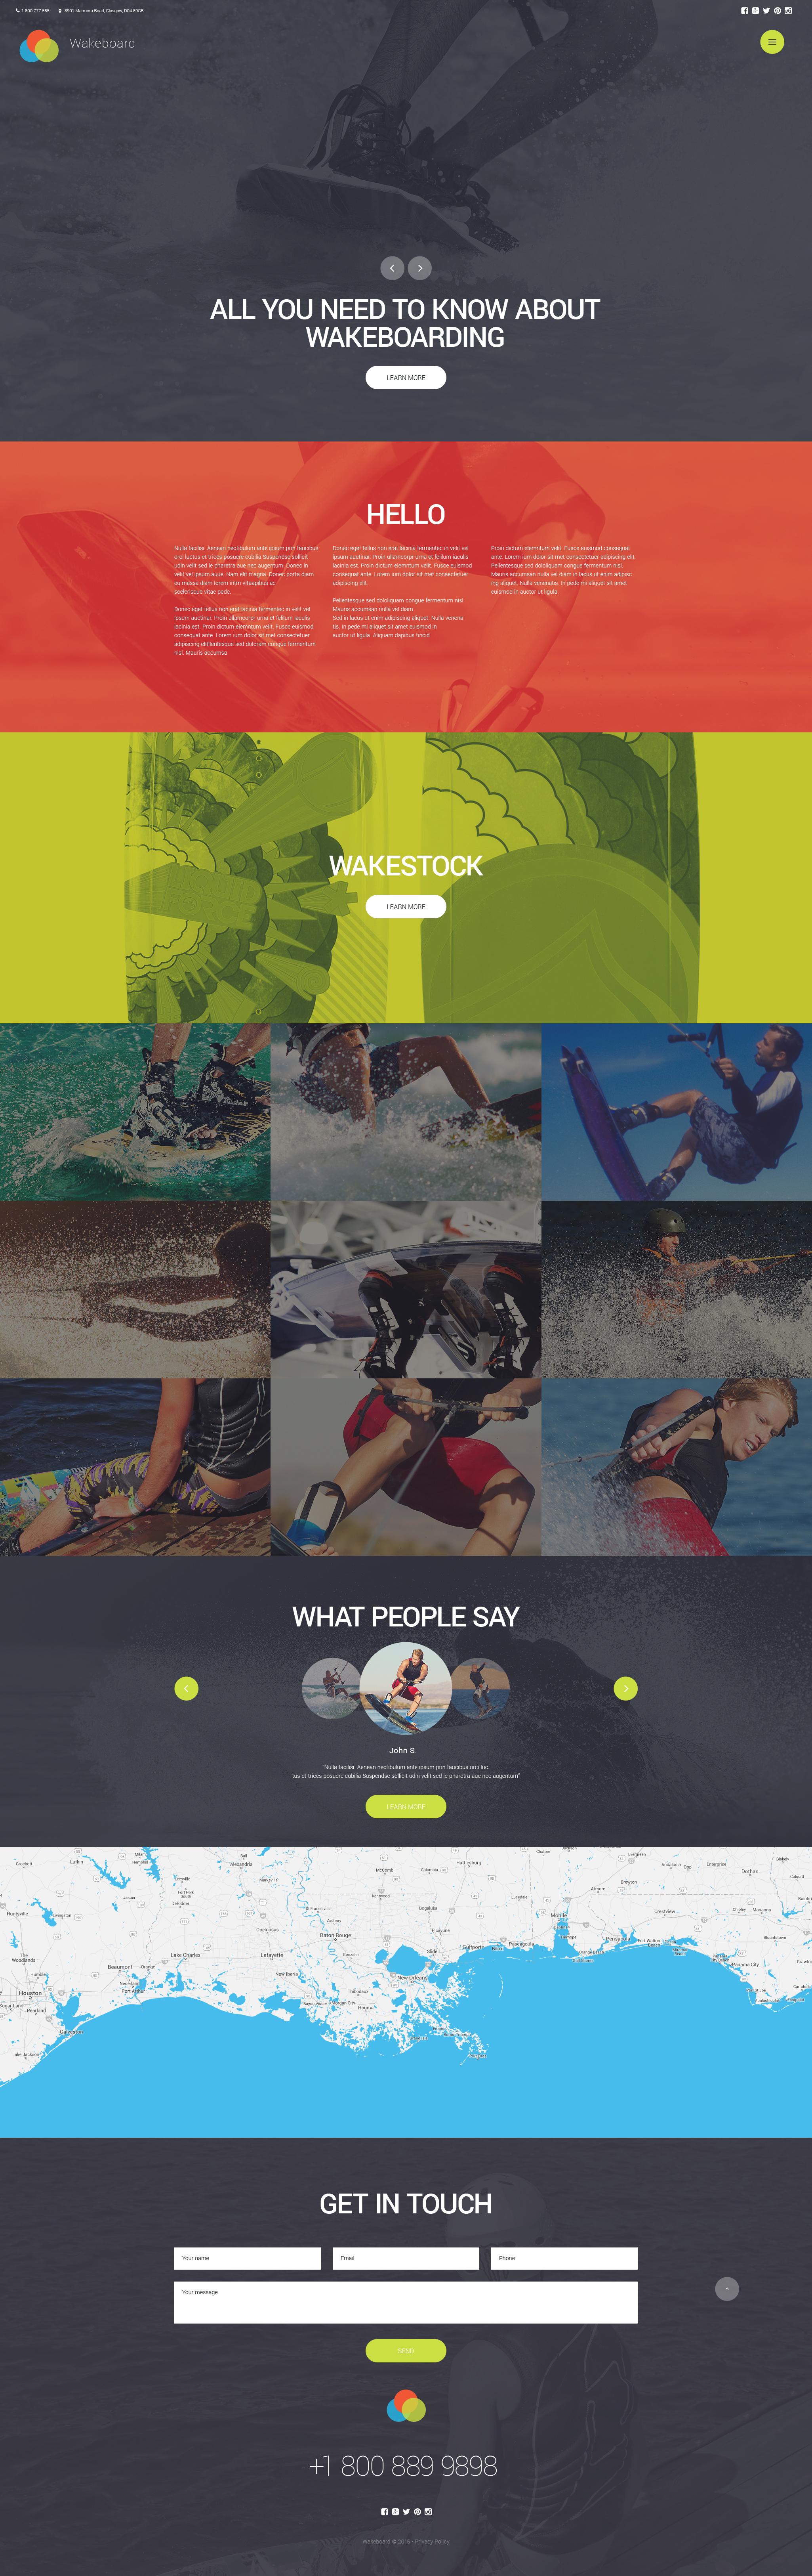 Wakeboarding Club Website Template